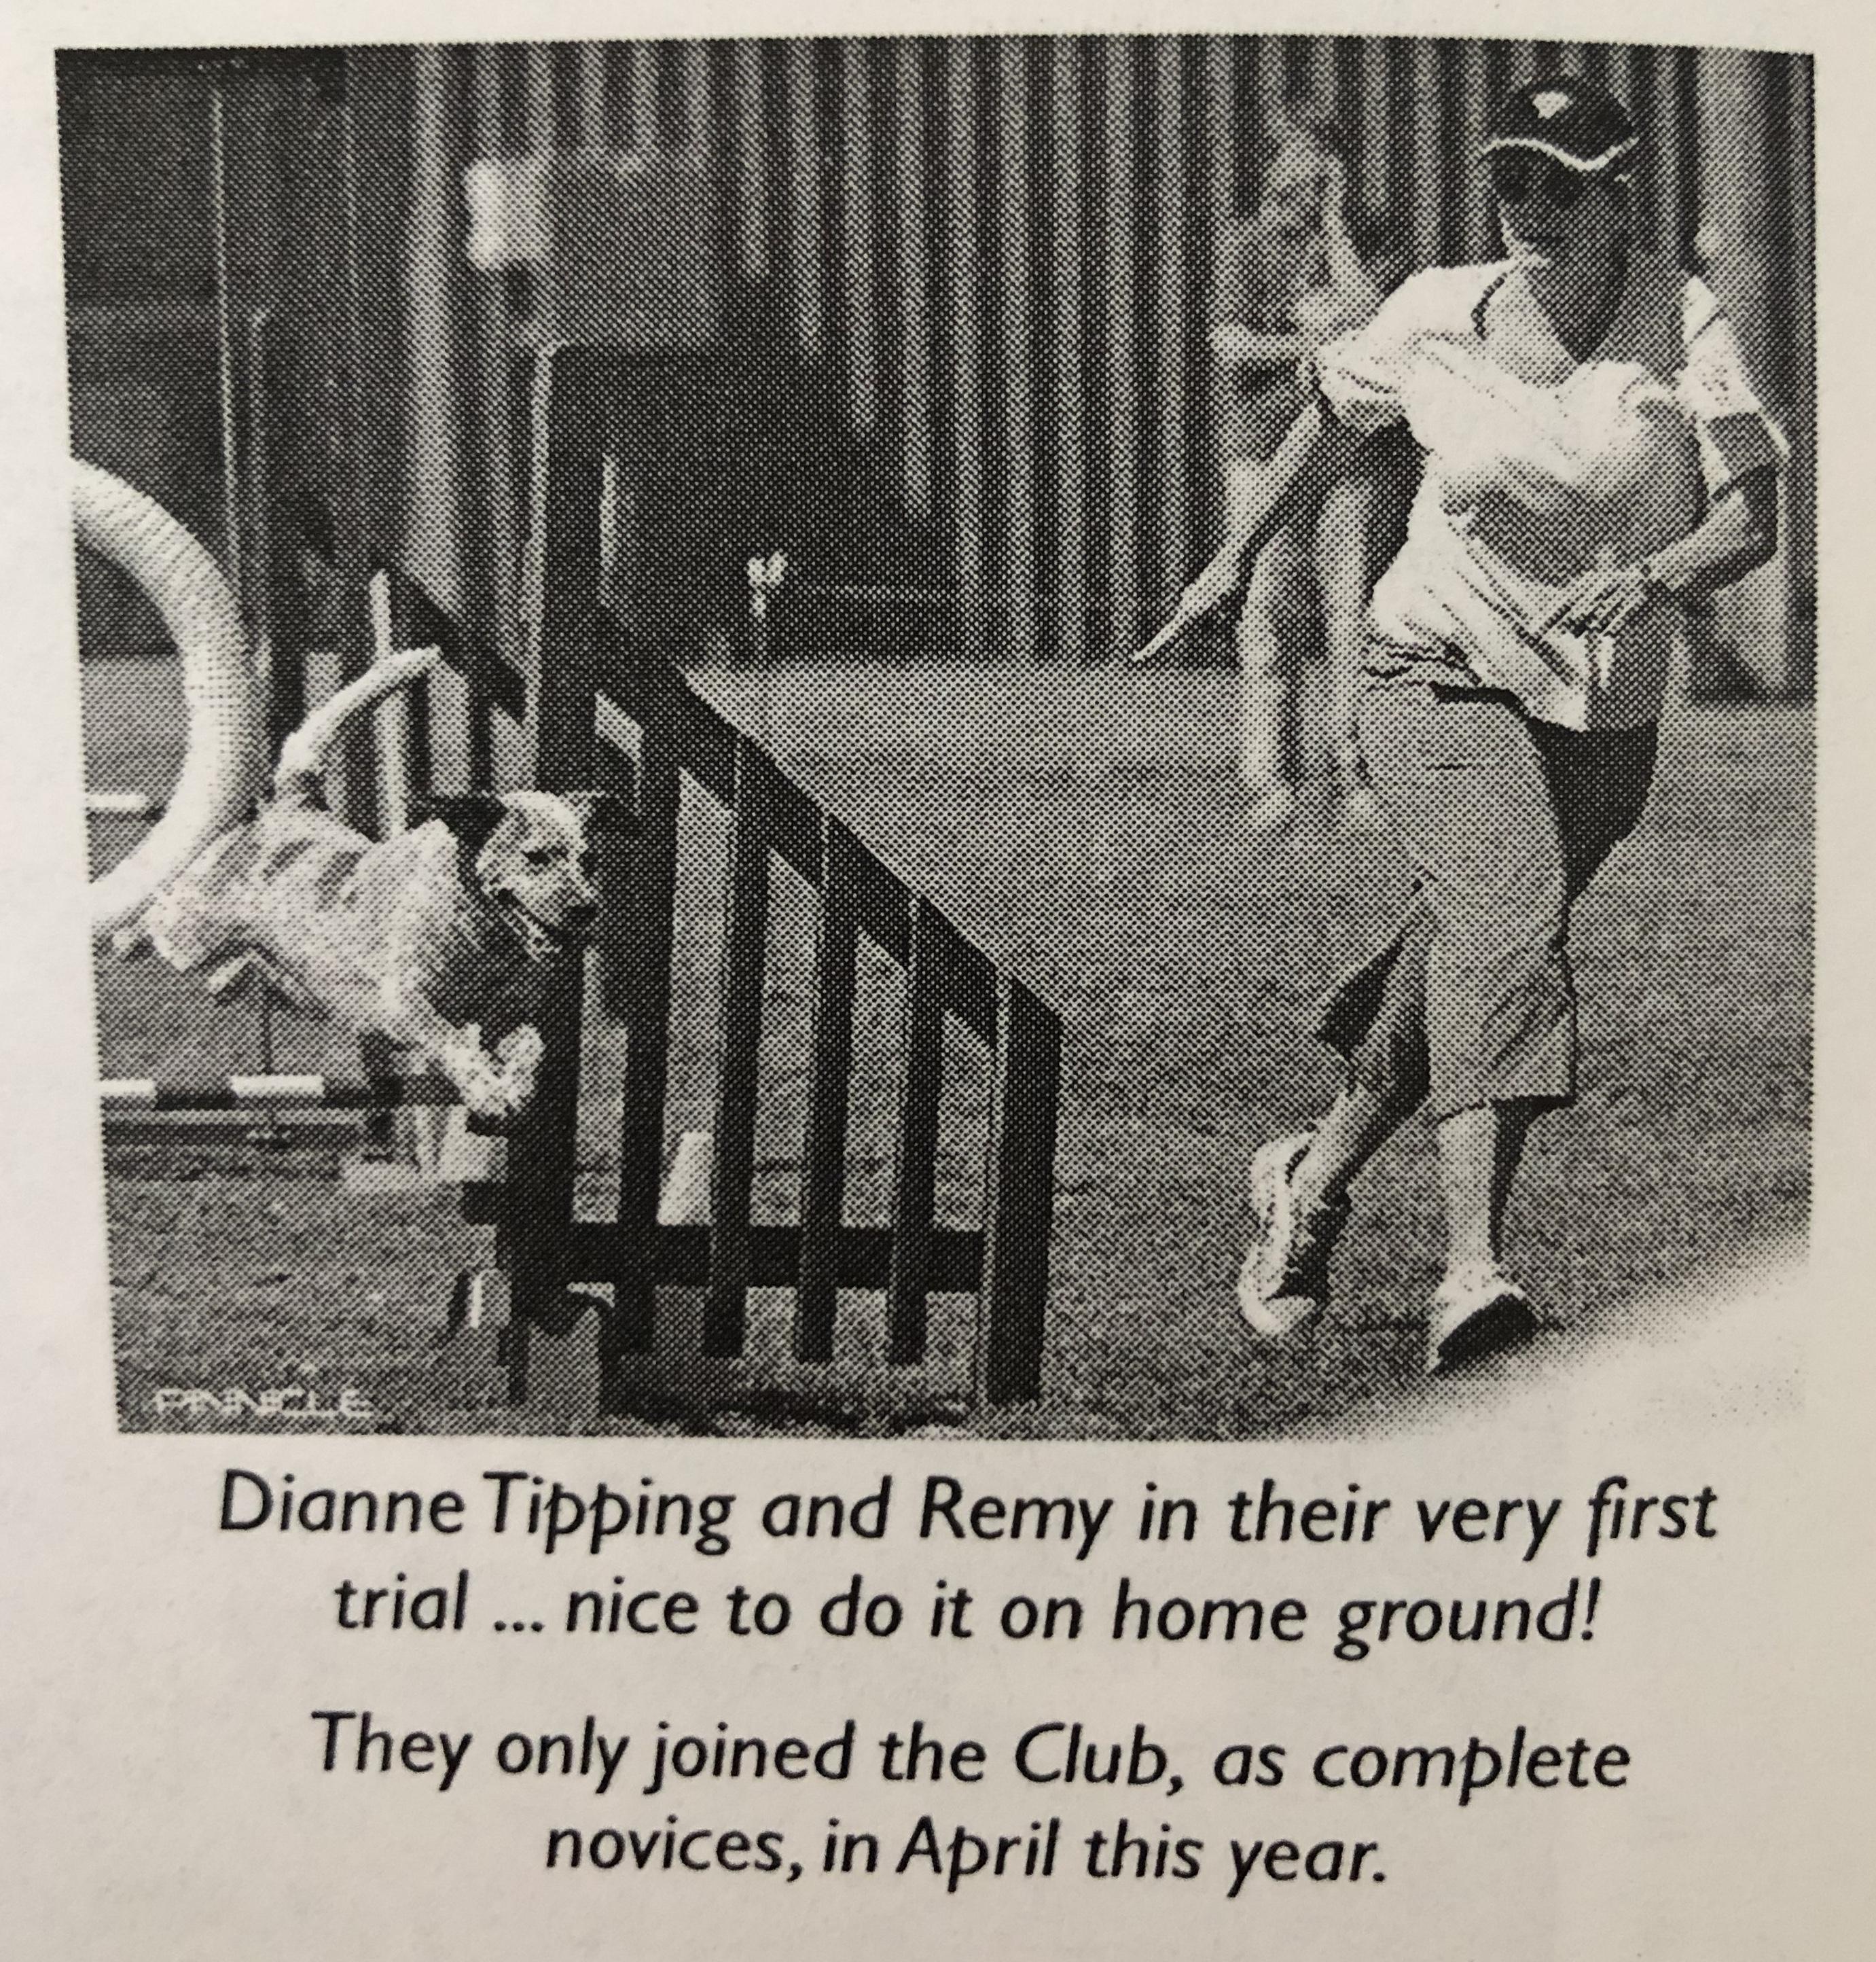 2006 Dianne